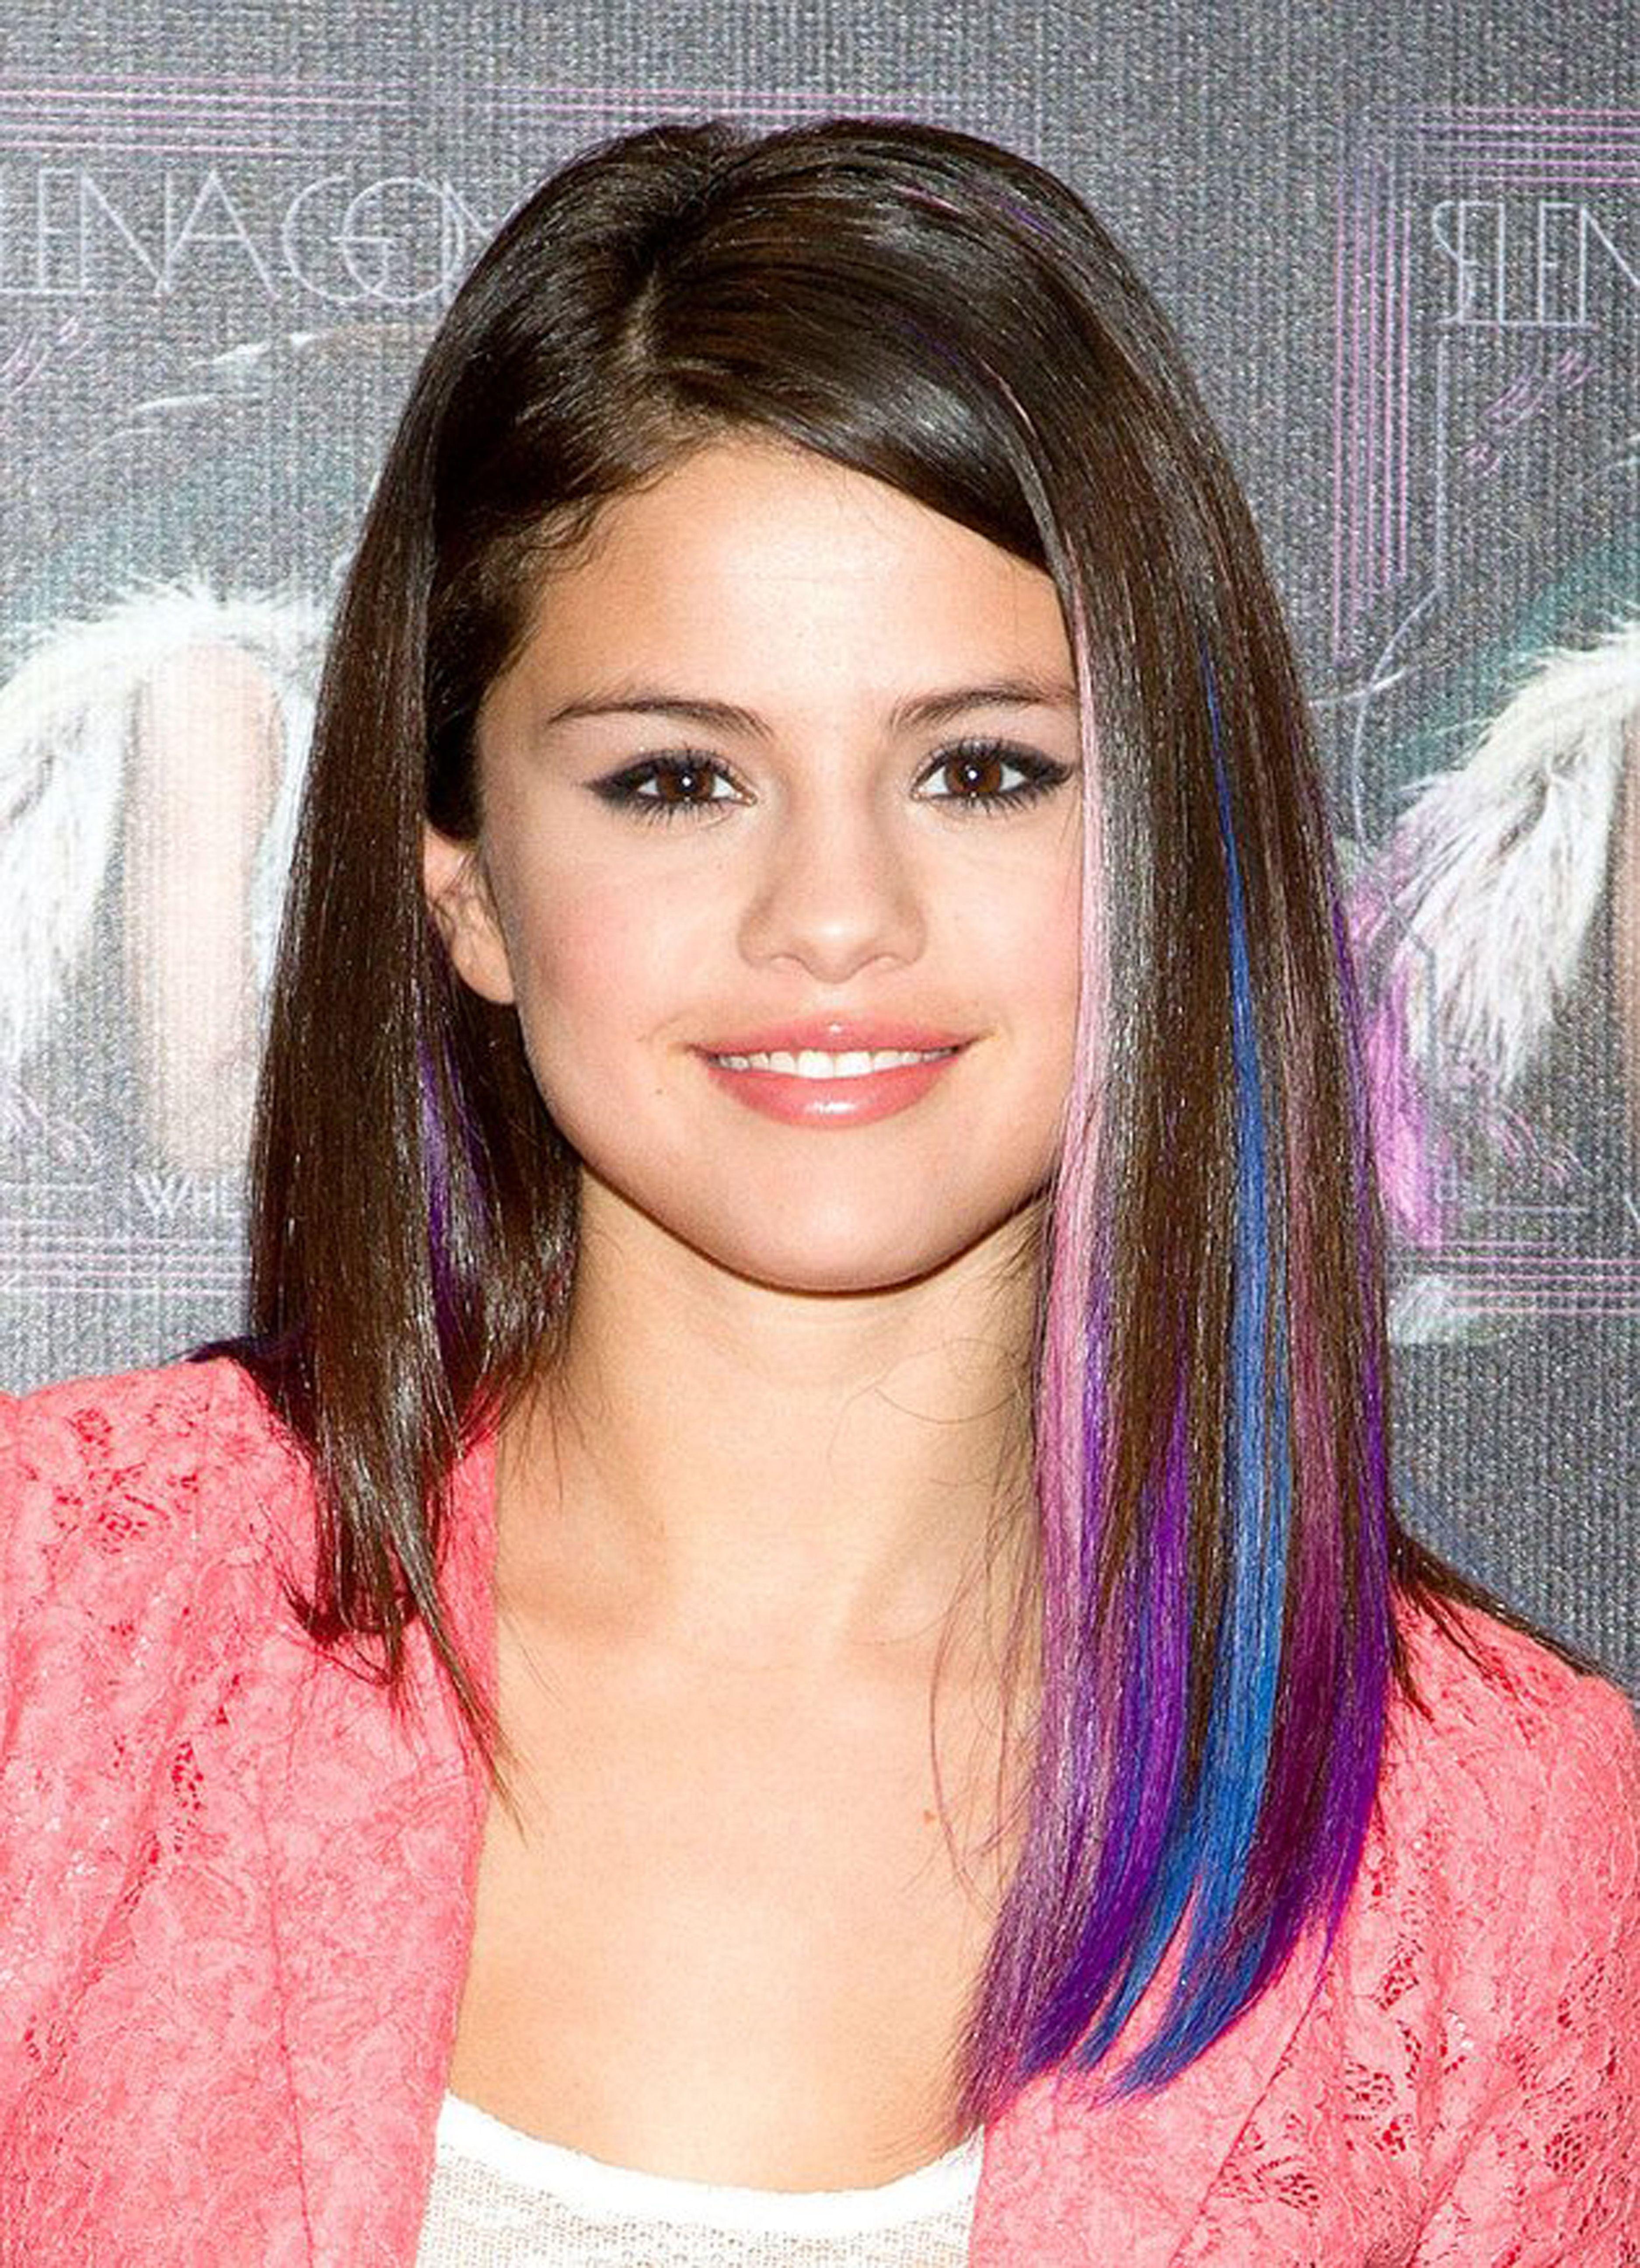 Selena Rockin Hairchalk Tinthairchalk Hair Chalk 3